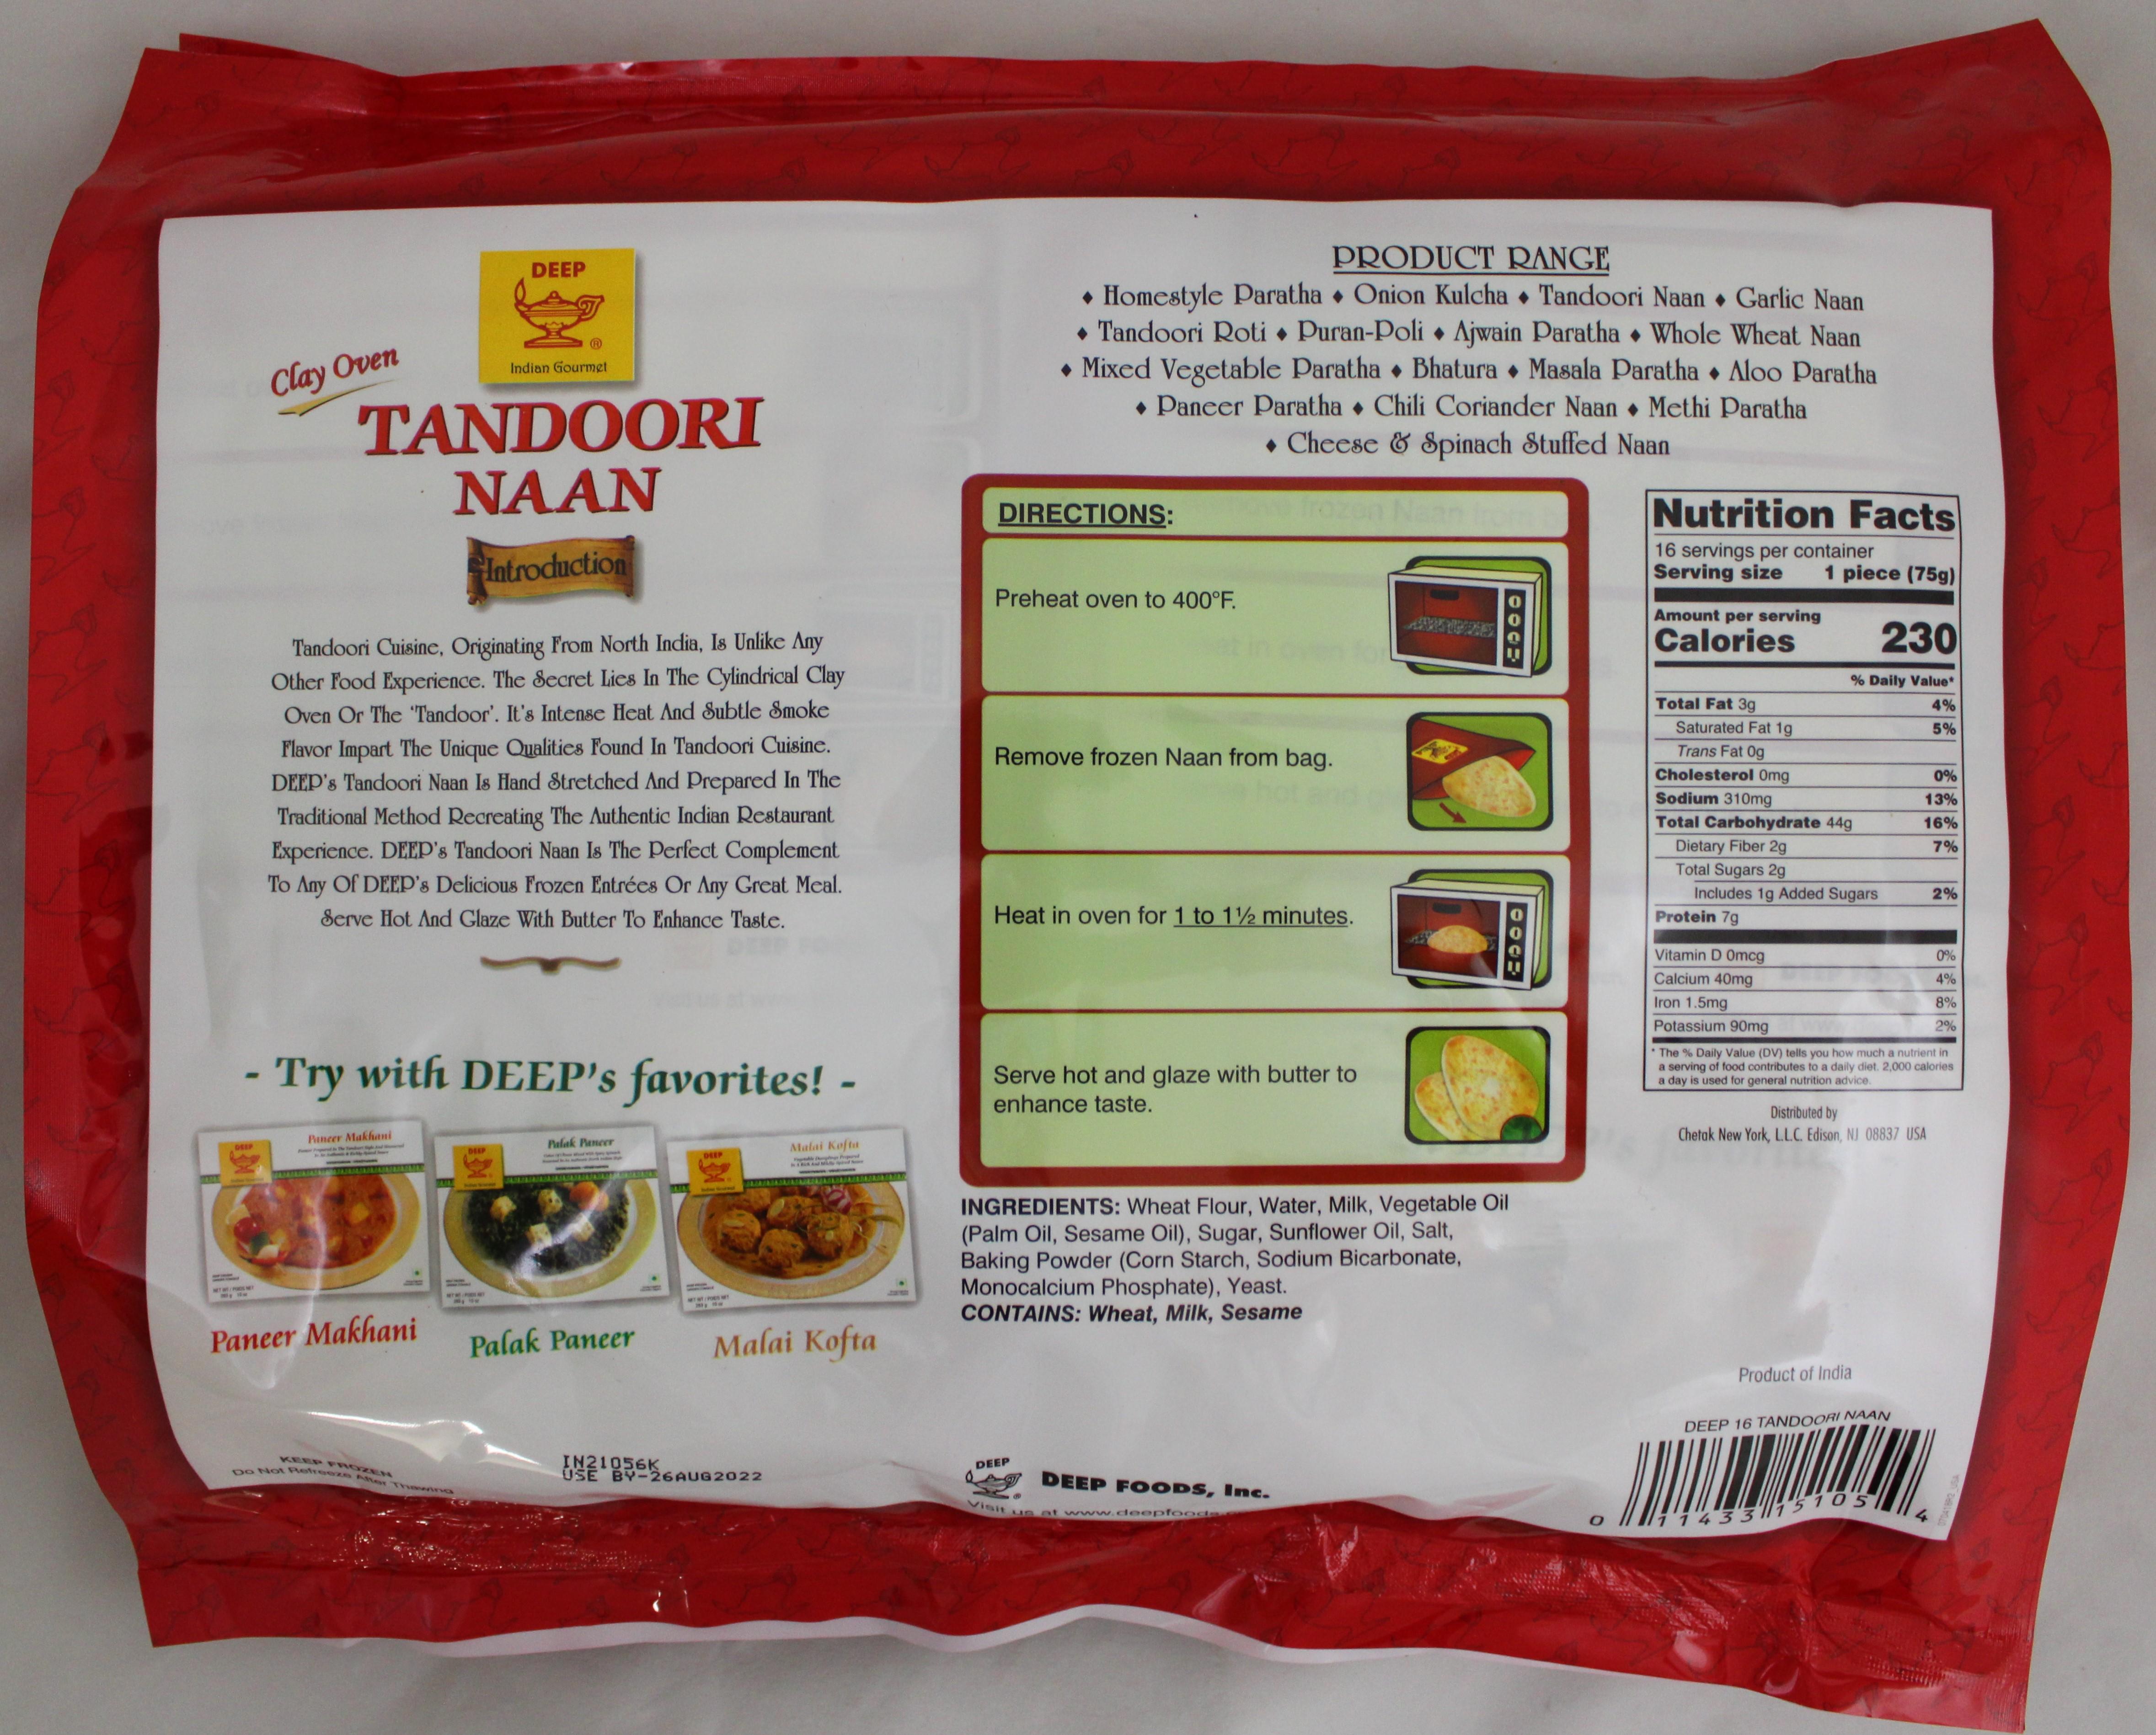 ClayOven Tandoori Naan FP 16P-2.6Lb